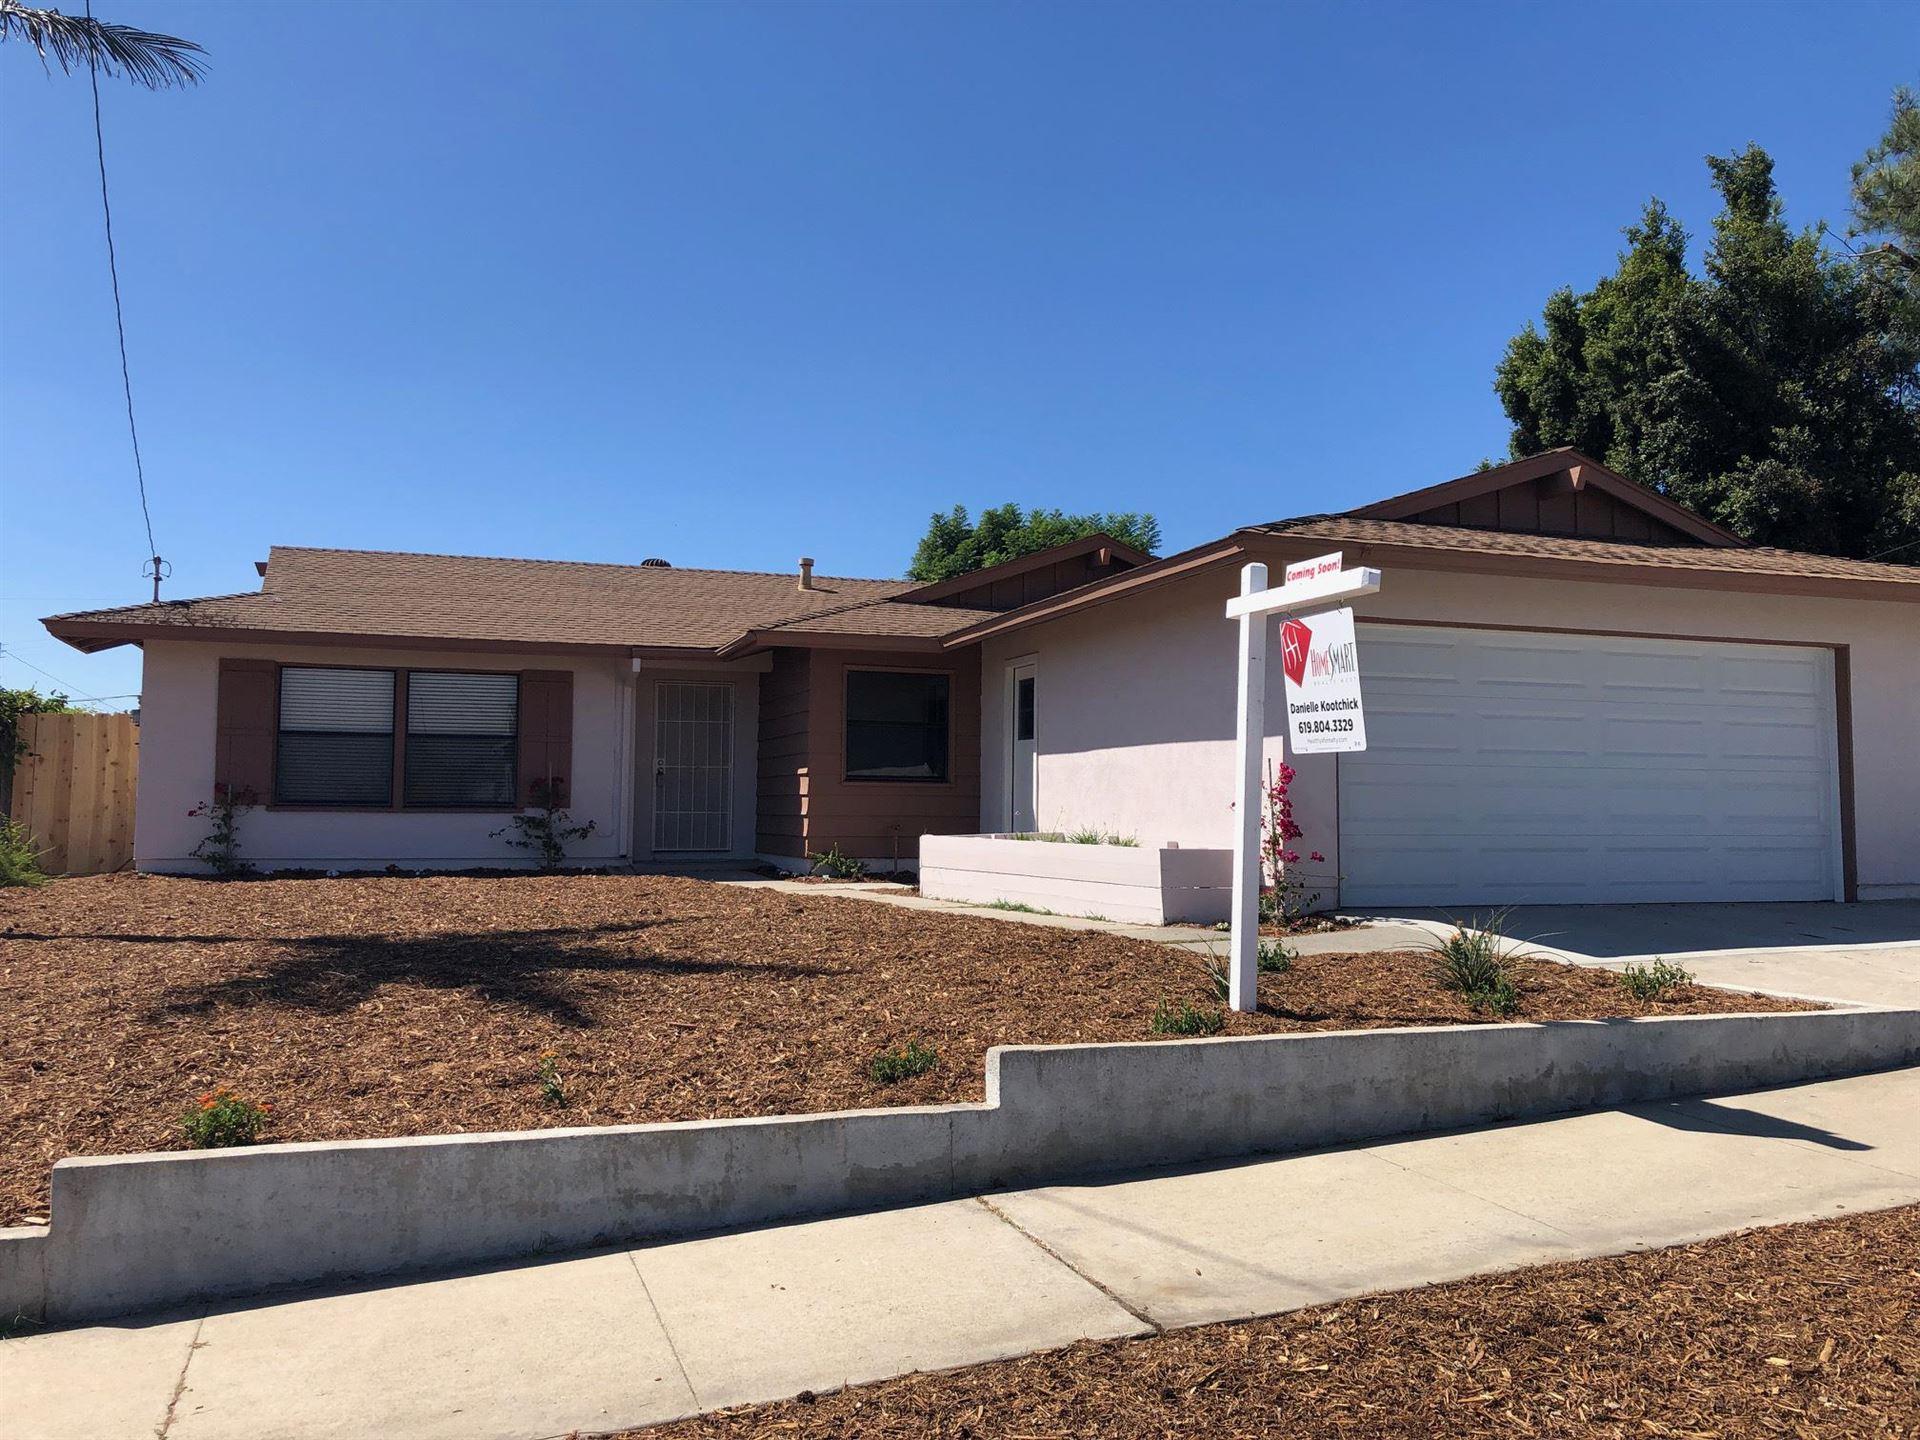 Photo of 2921 Altura Drive, Oceanside, CA 92056 (MLS # 200045446)